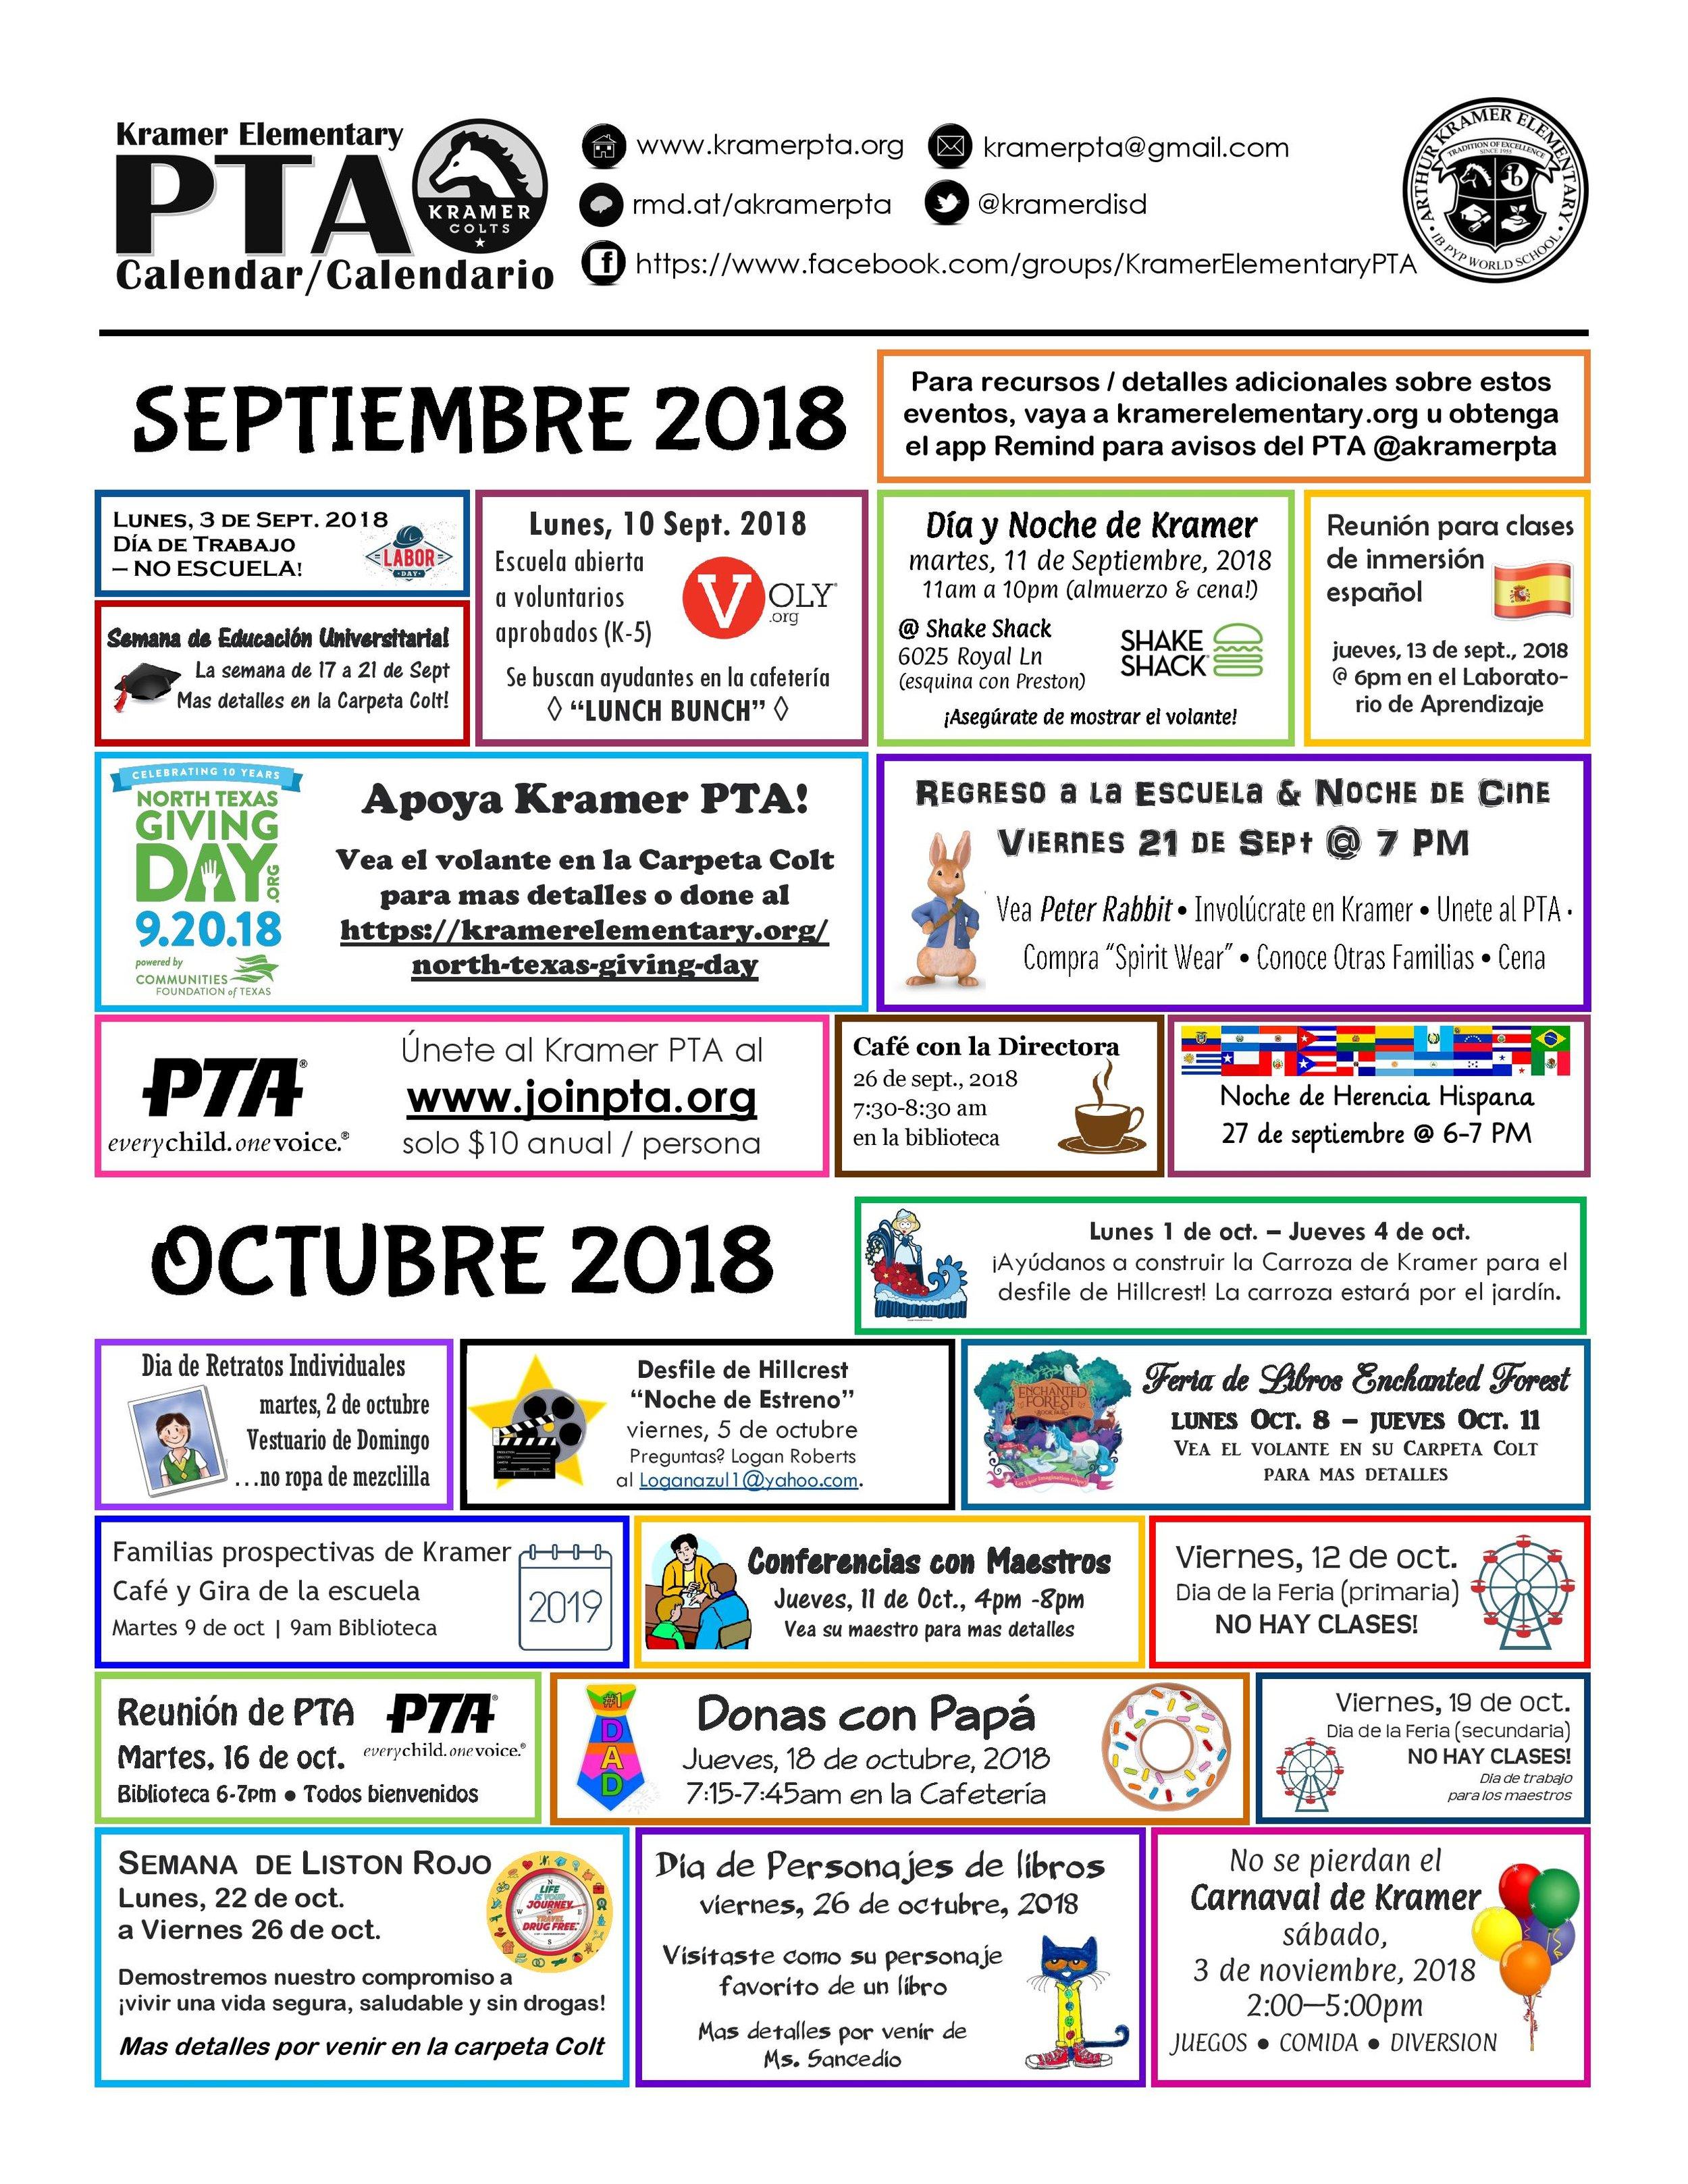 PTACalendar09_10_2018-page-002.jpg